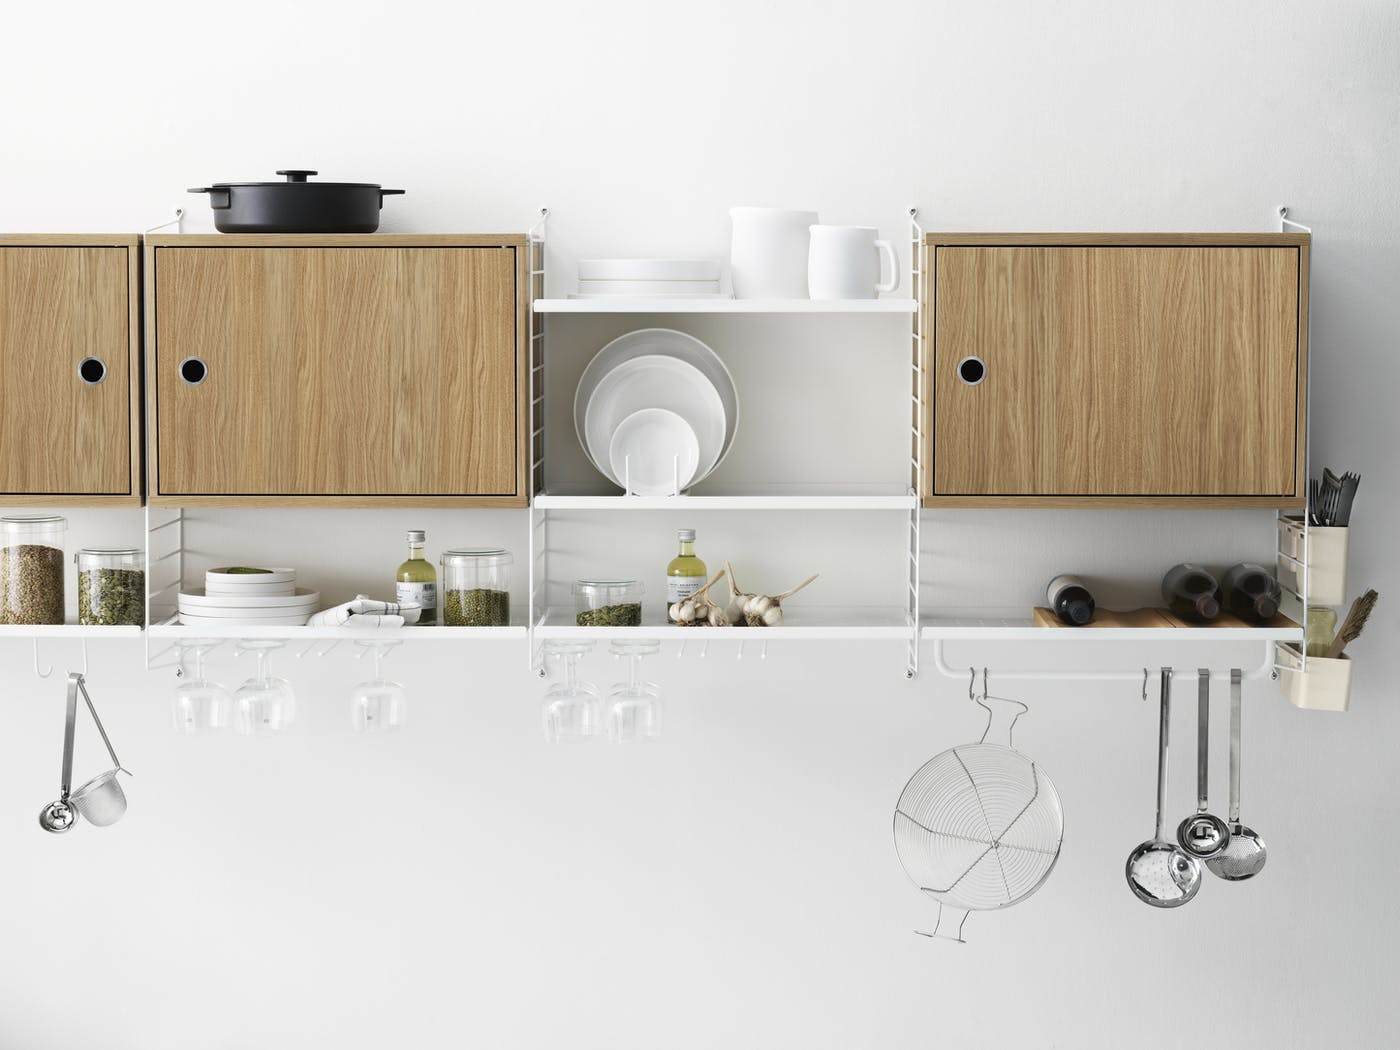 Solution string system kitchen white oak accessories landscape